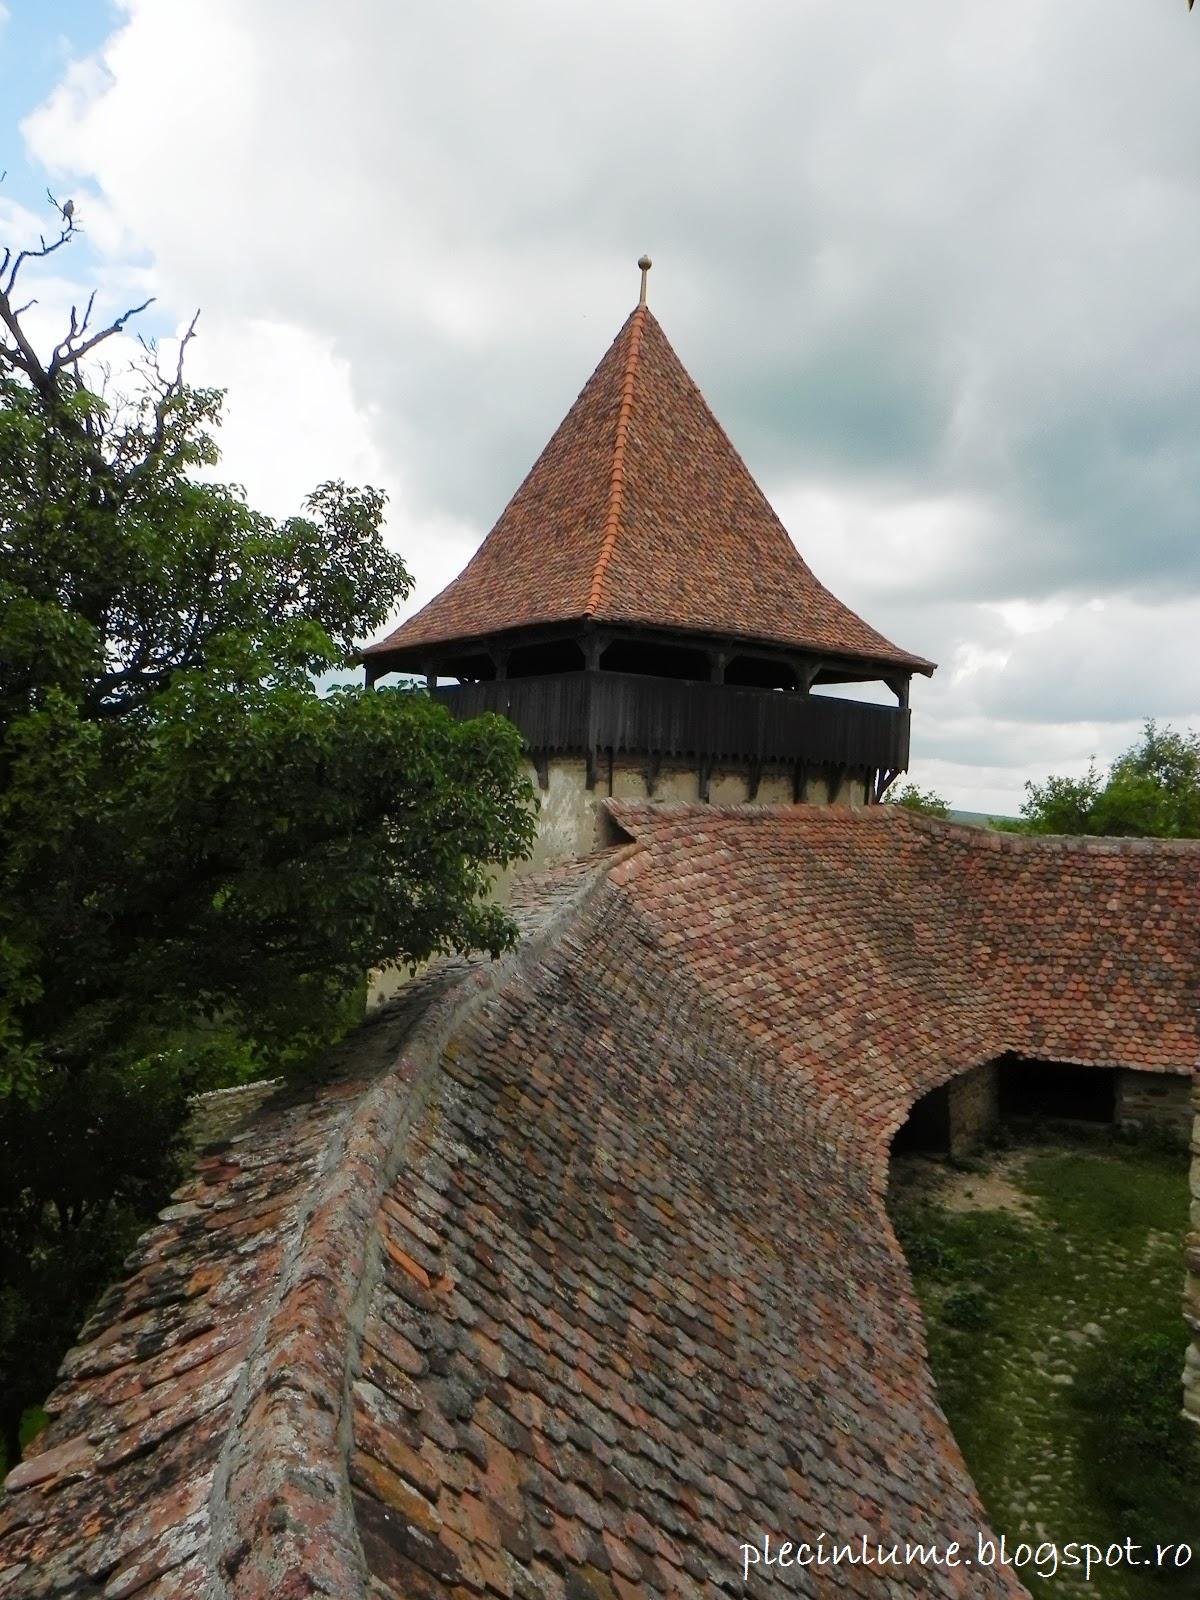 Acoperisul bisericii din Viscri